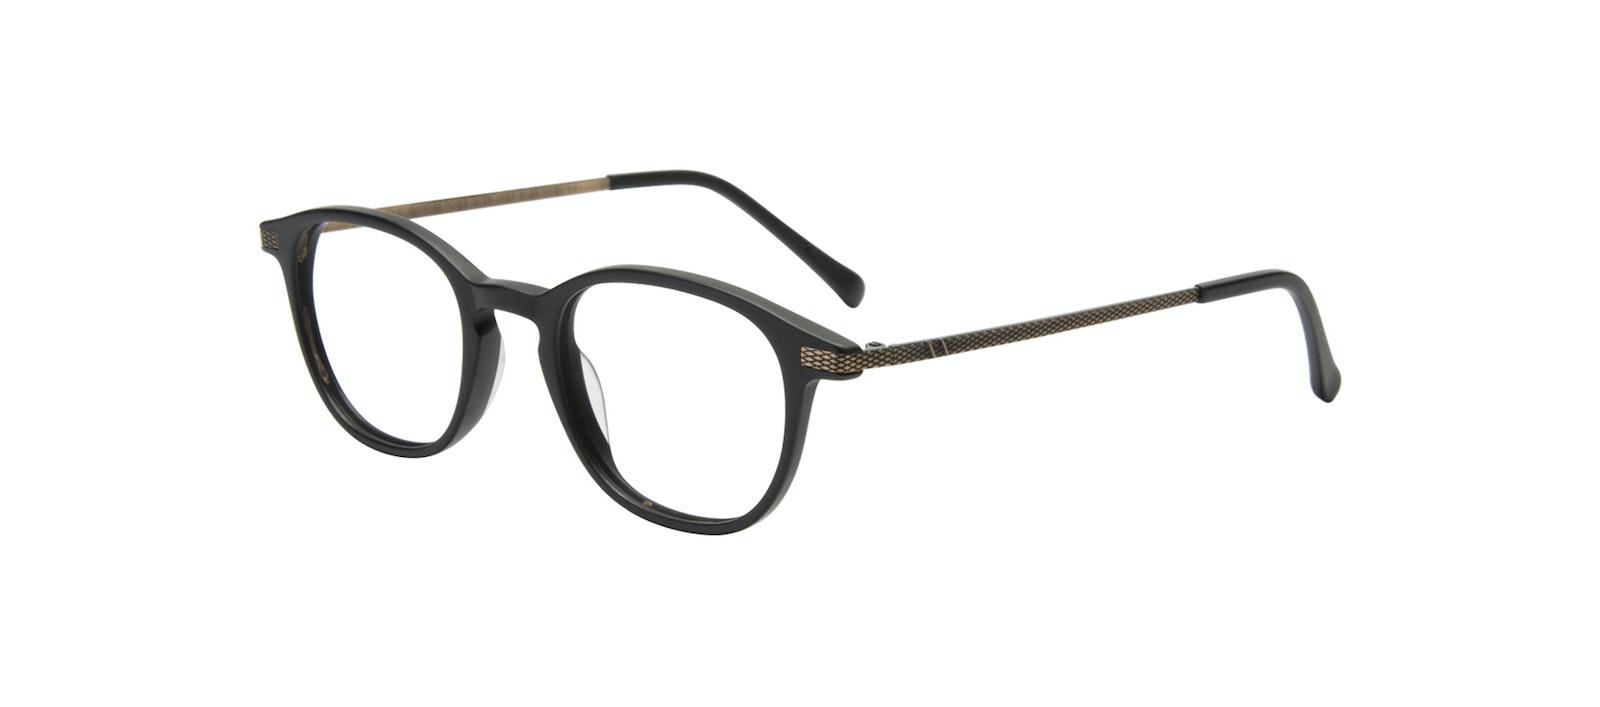 Affordable Fashion Glasses Round Eyeglasses Men Tux Onyx Matte Tilt